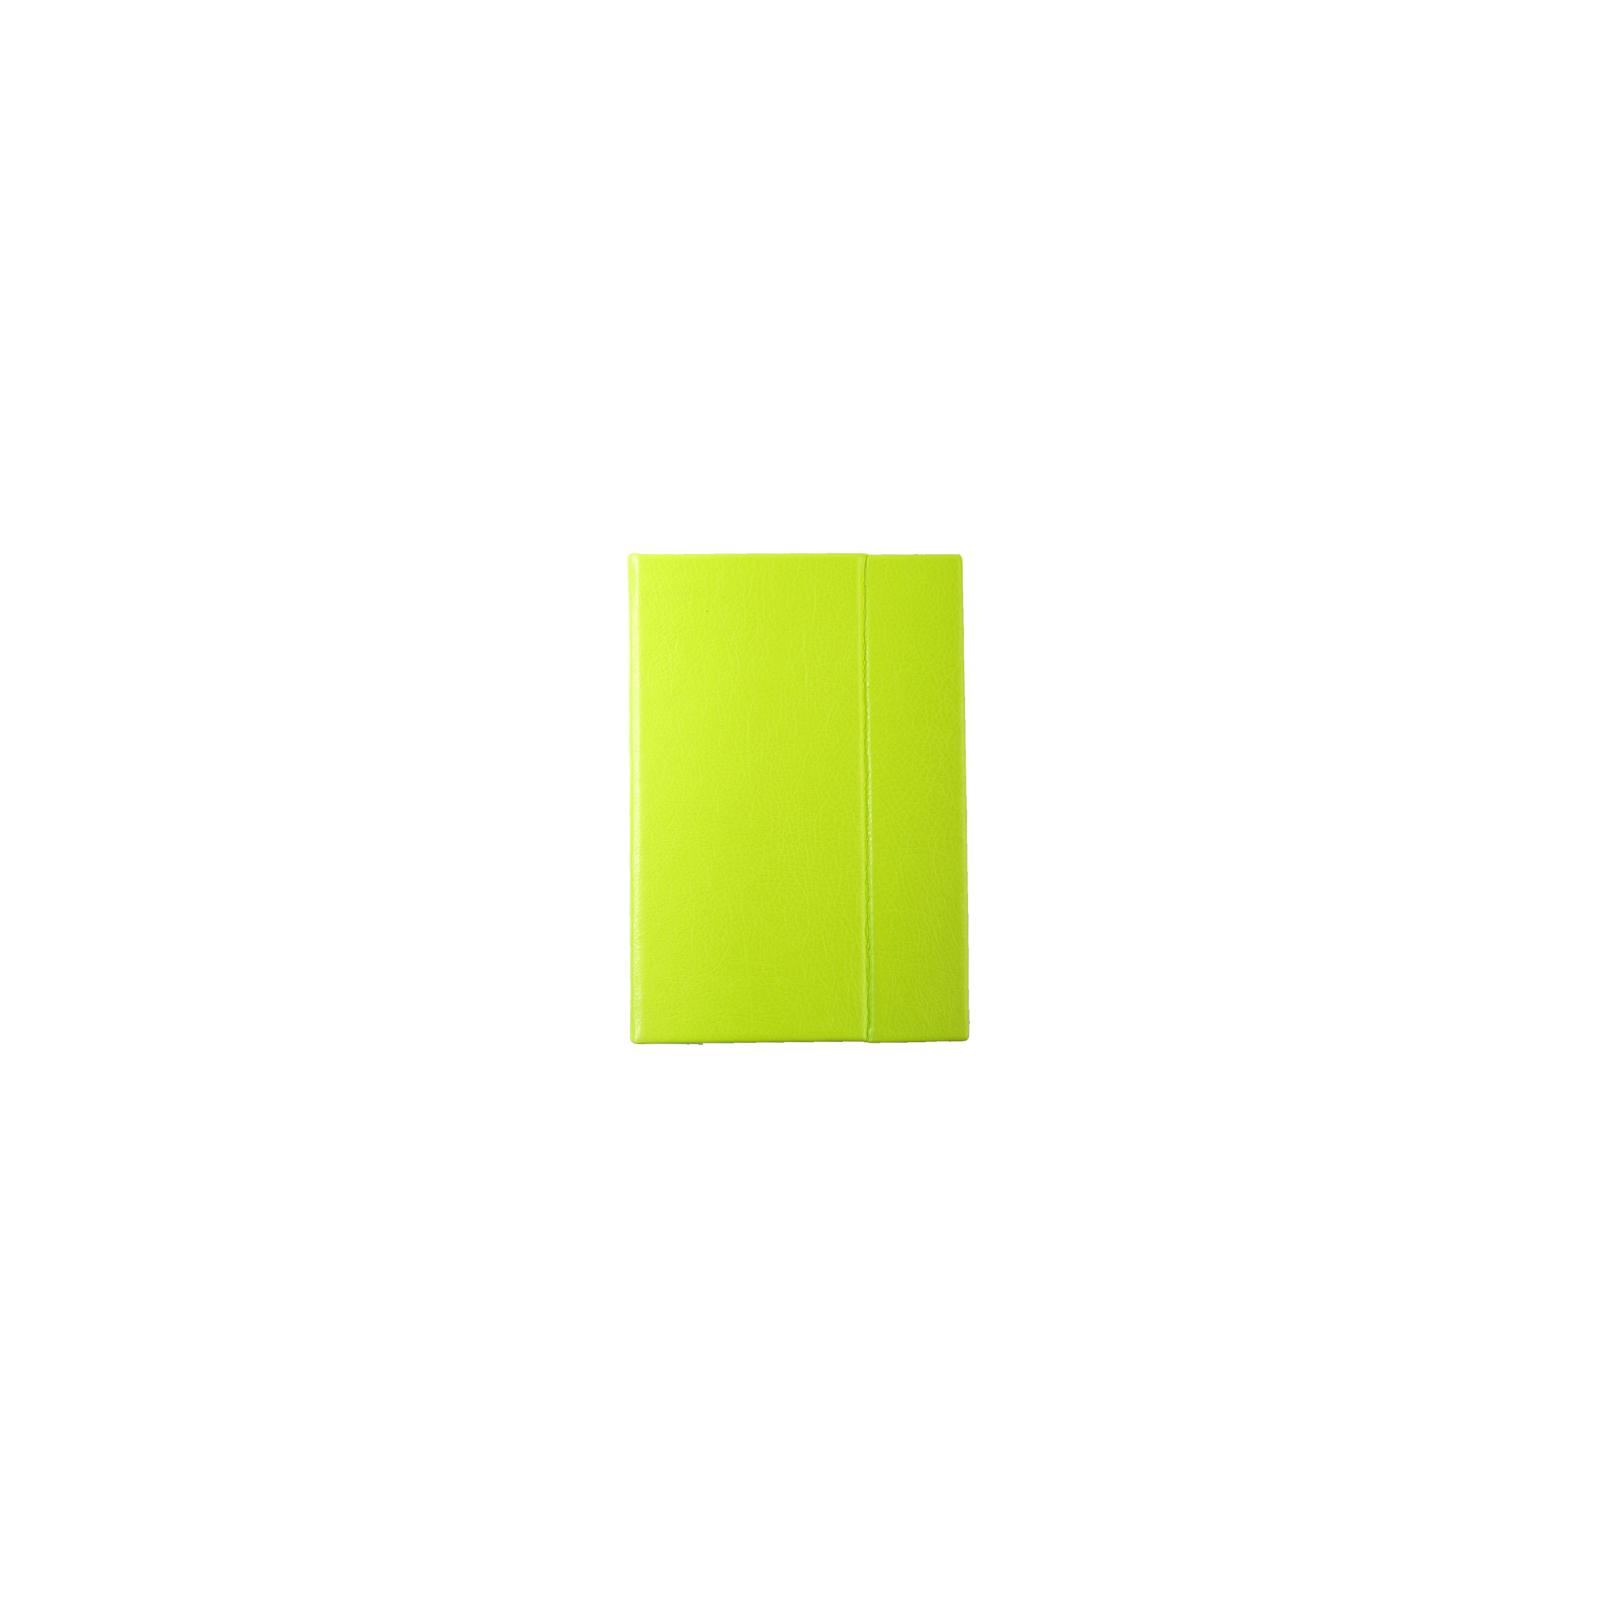 Чехол для планшета Vento 7 Desire Bright - lime изображение 2